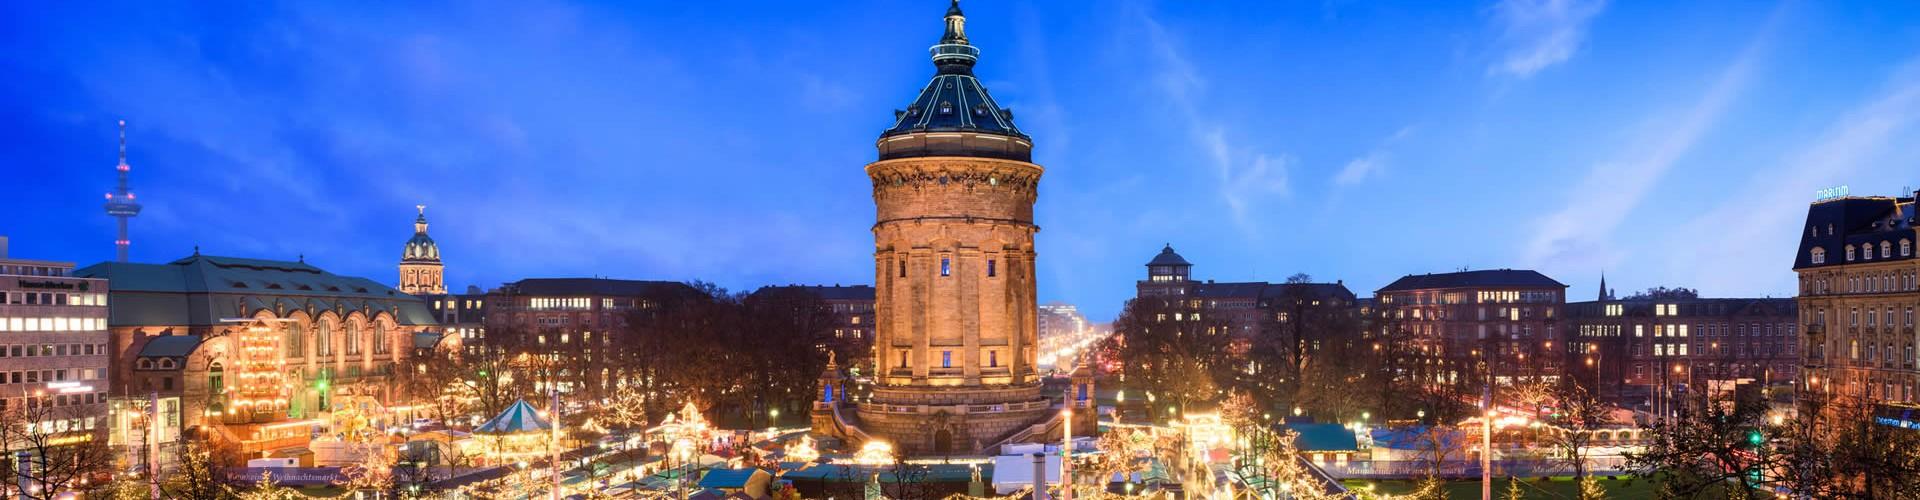 PLZ Mannheim